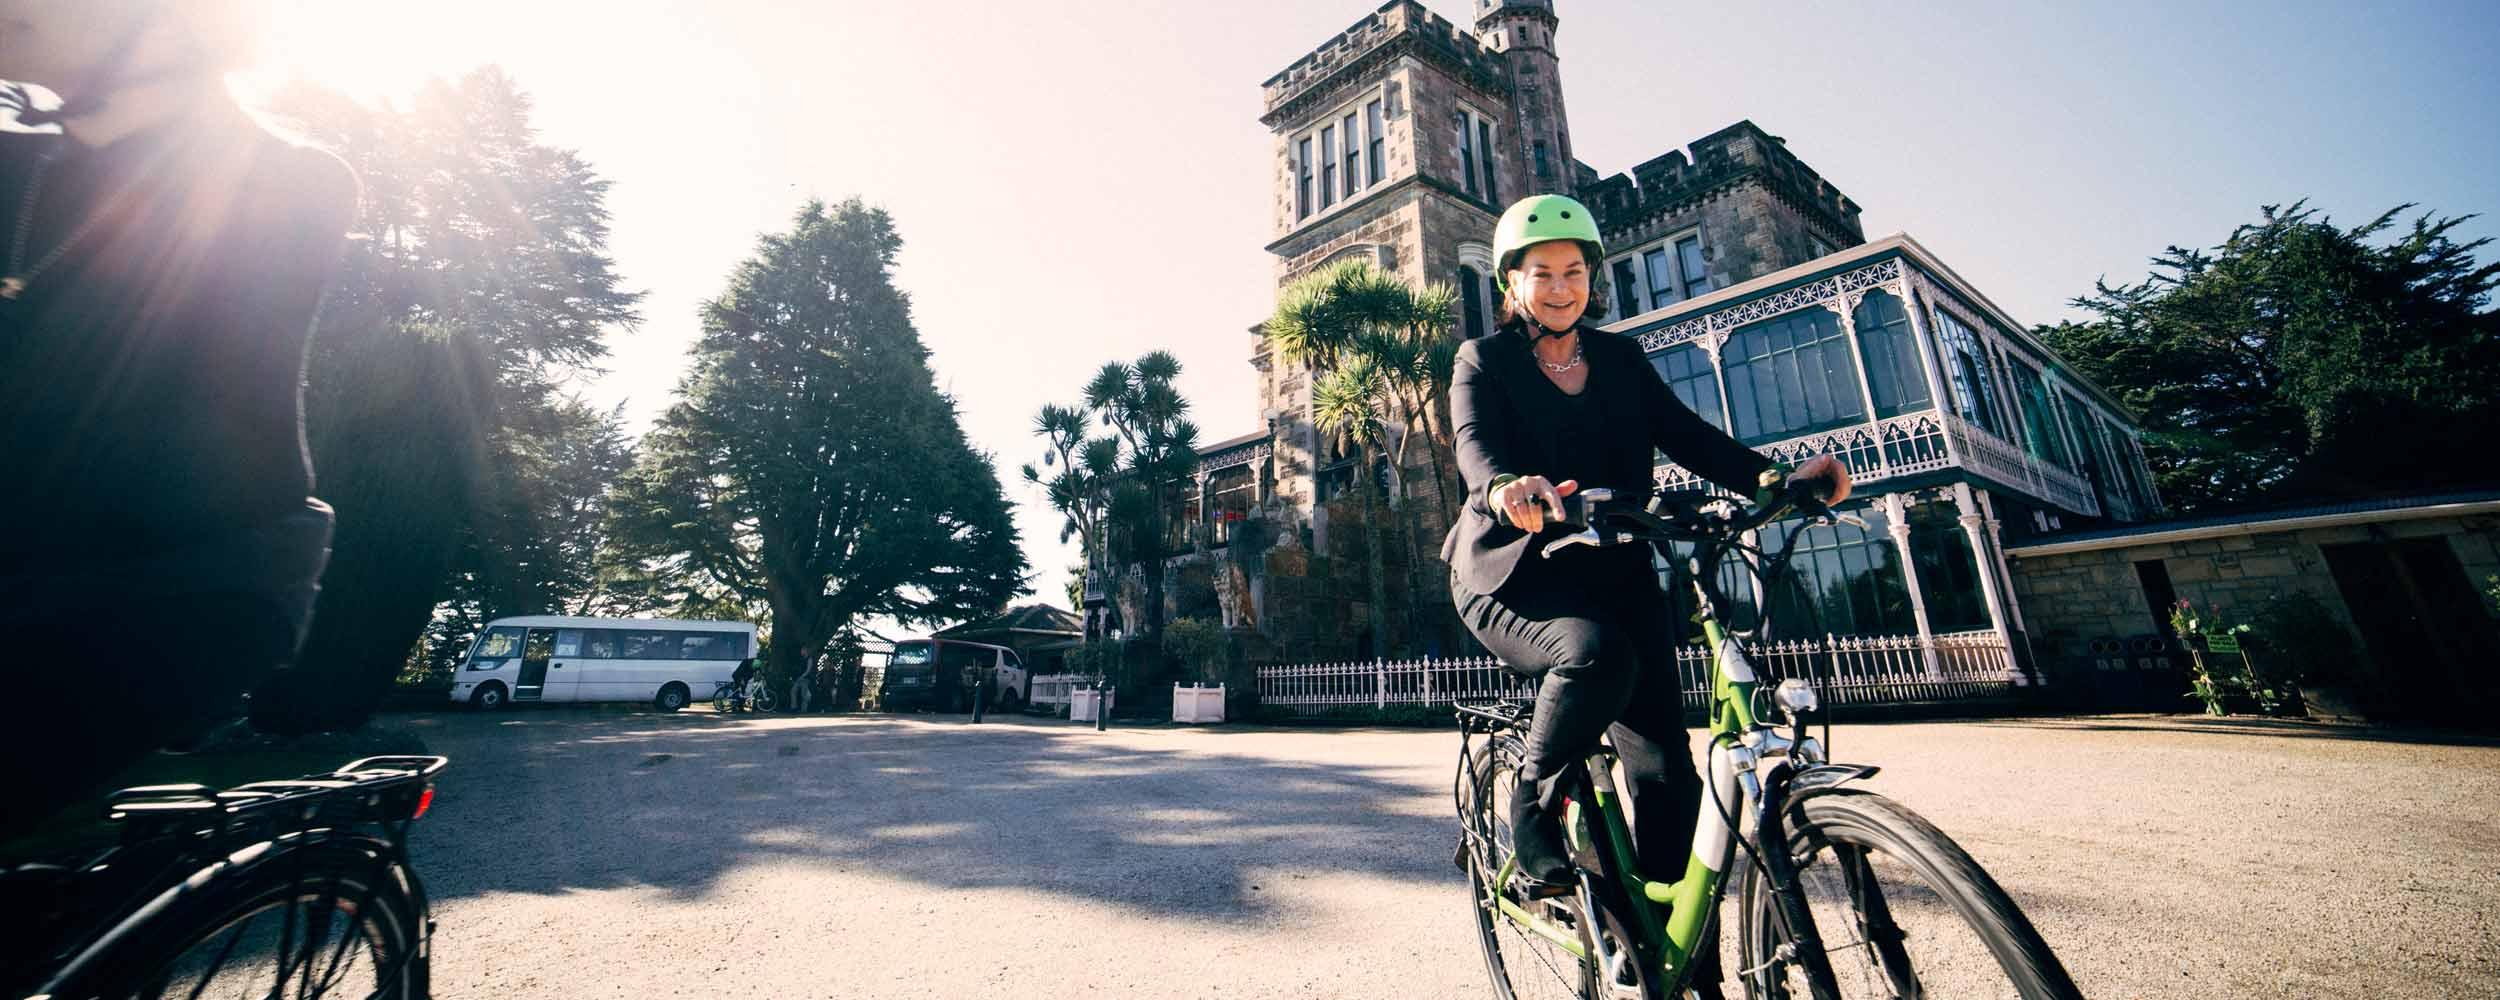 Larnach Castle Green Bikes